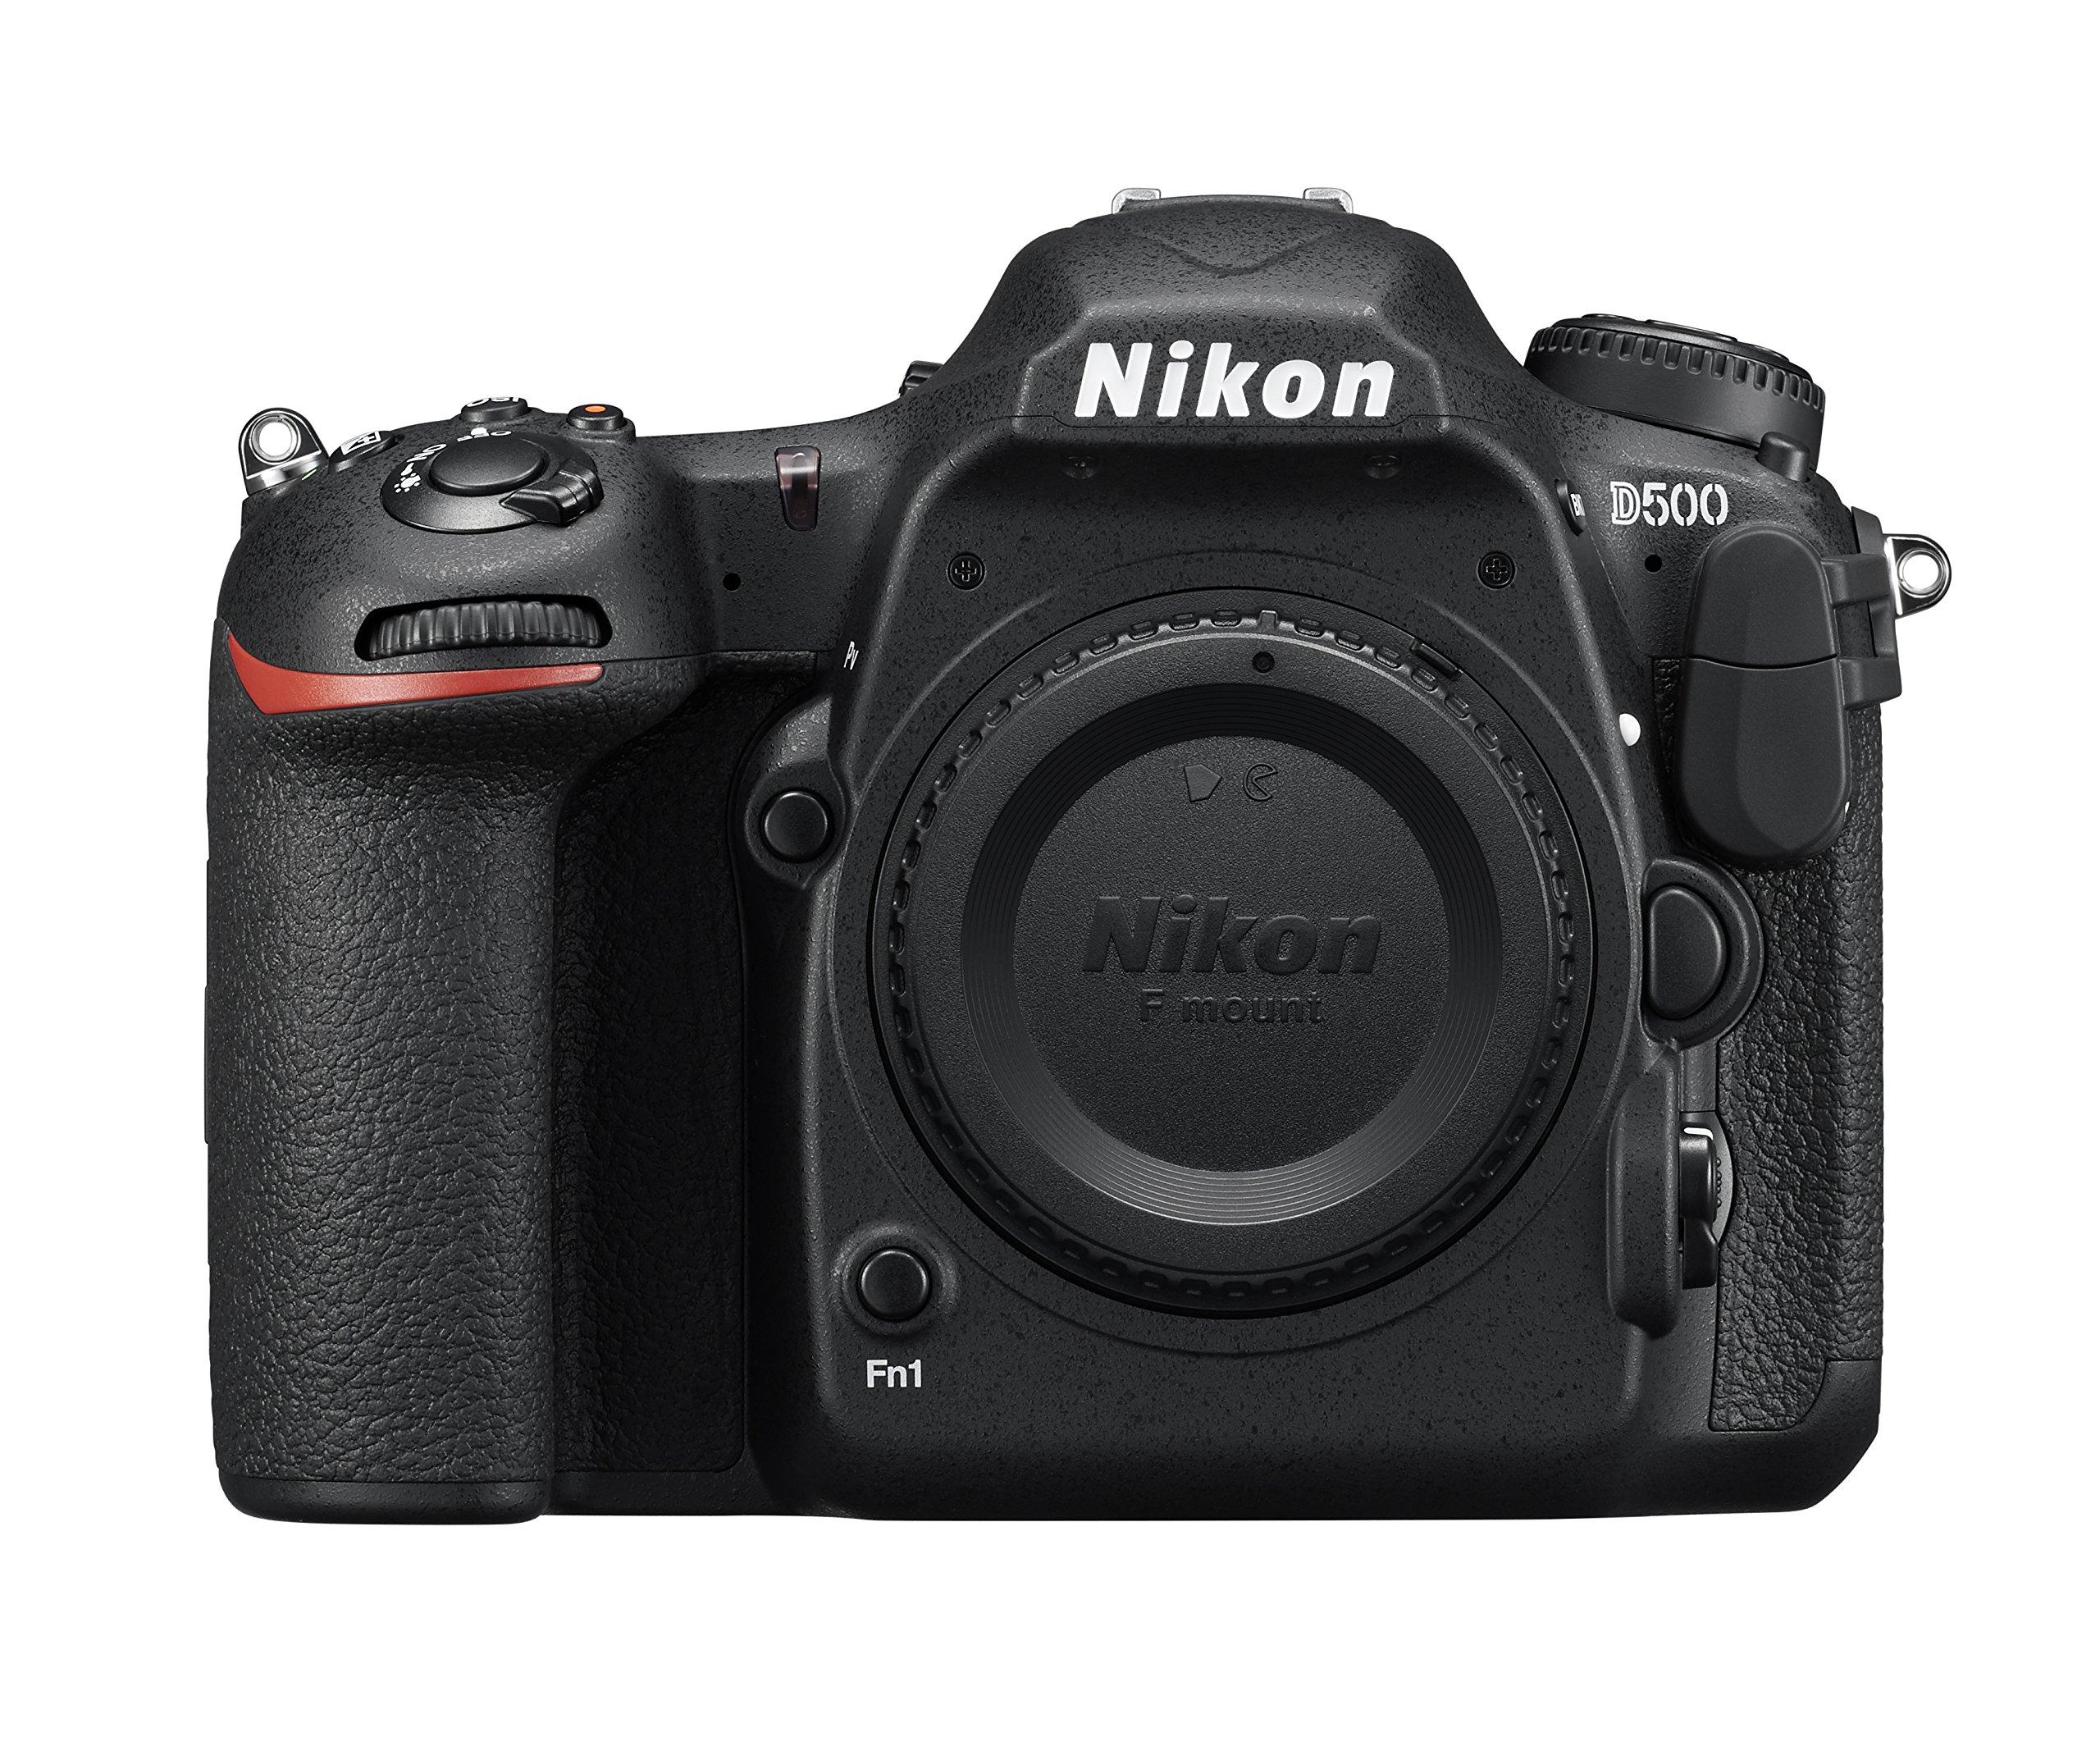 Nikon D500 DX-Format Digital SLR (Body Only) by Nikon